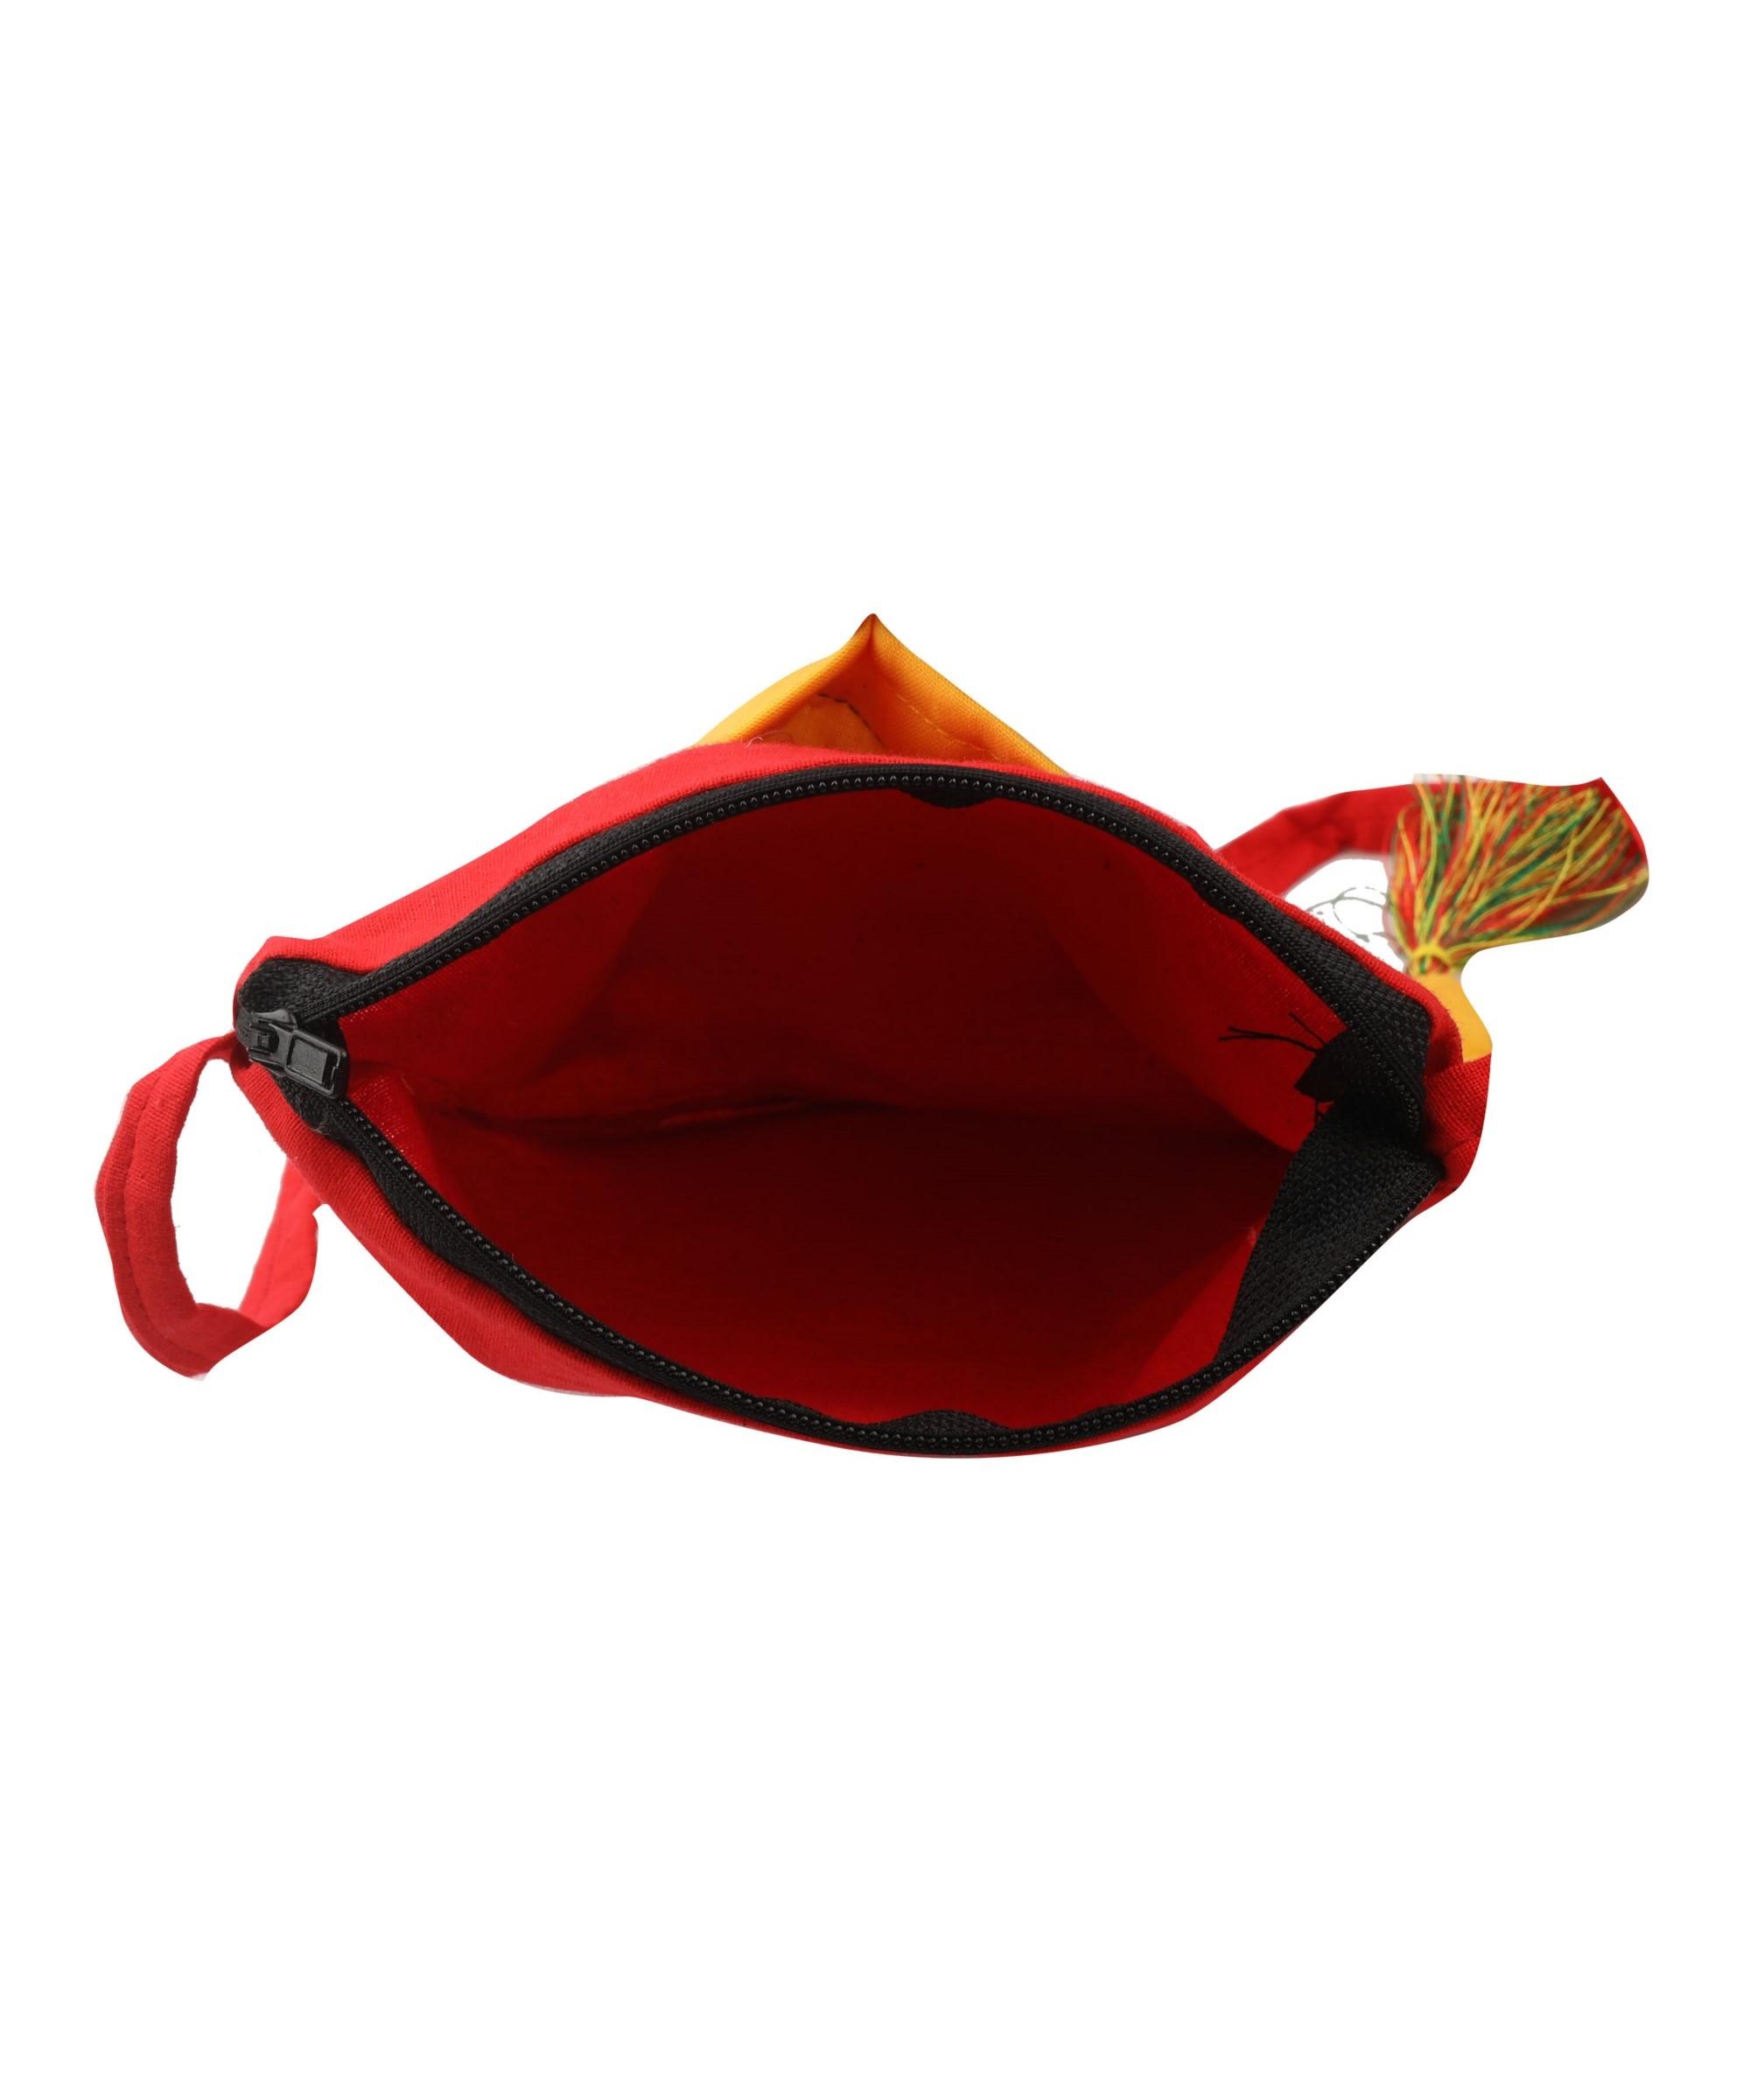 WIEA Turmeric Yellow Sling Bag (Set of 2) Slider 5/5